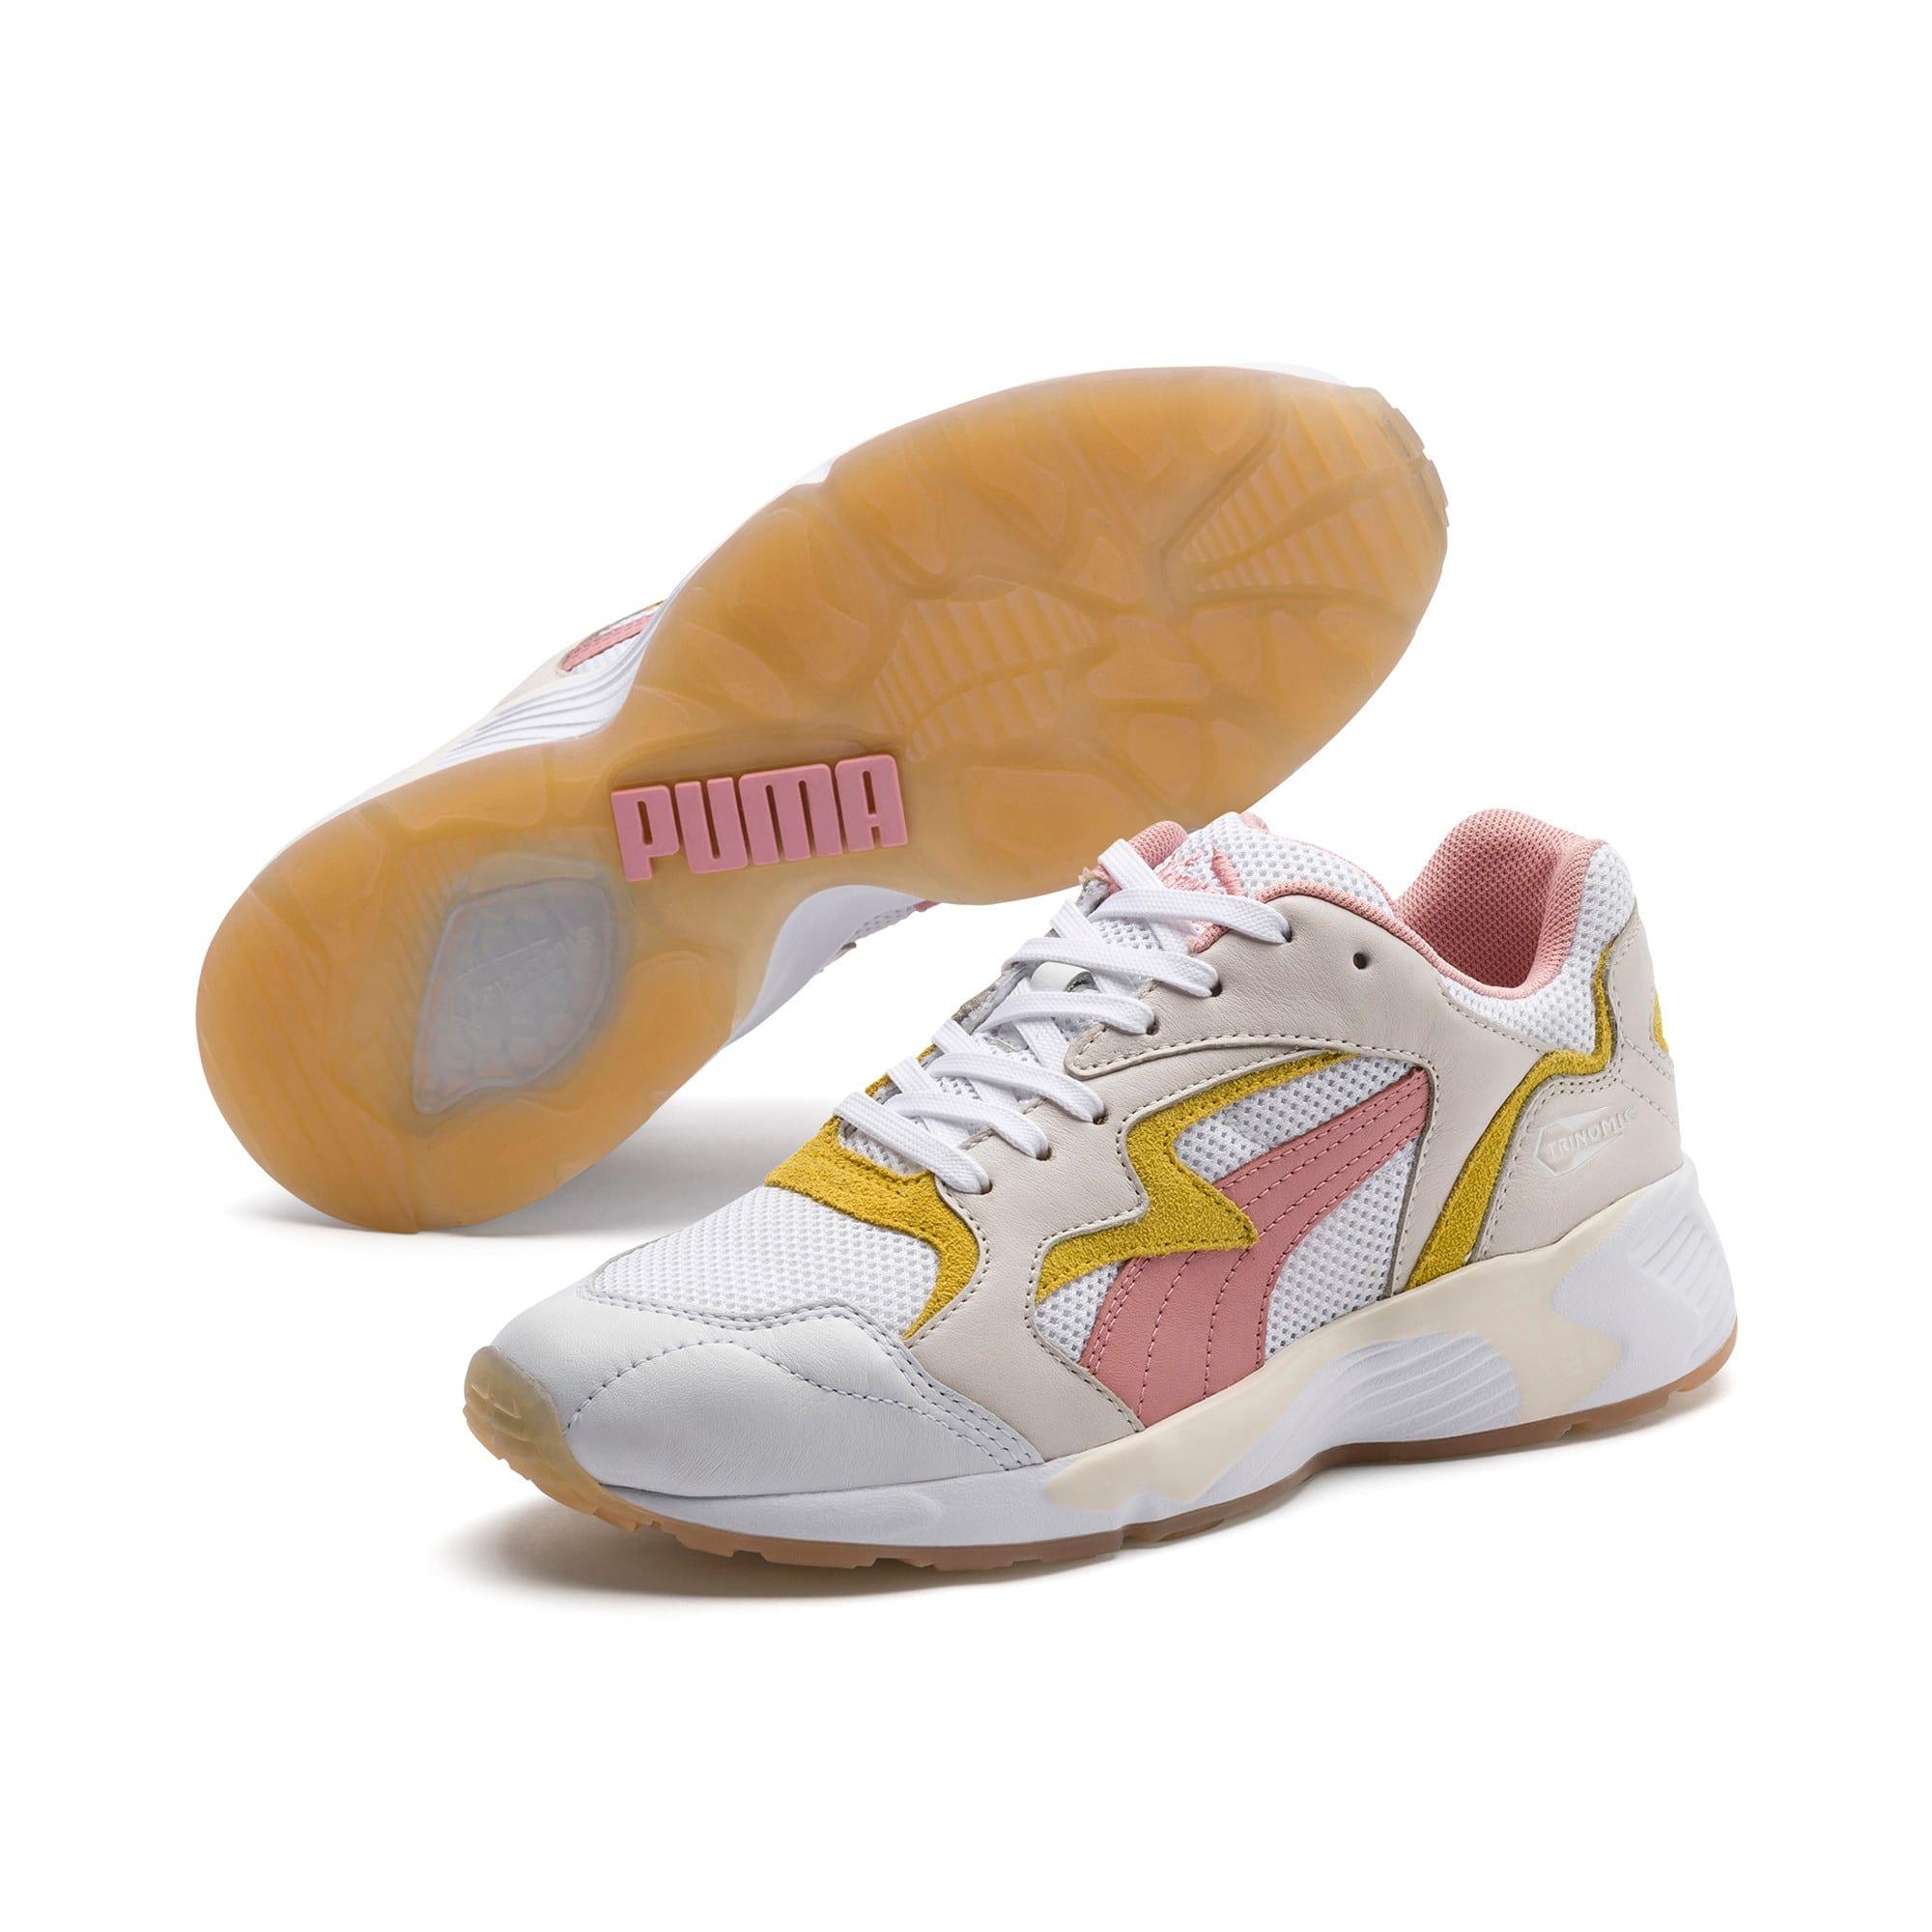 Thumbnail 2 of Scarpe da ginnastica Prevail Classic, Puma White-Sulphur, medium